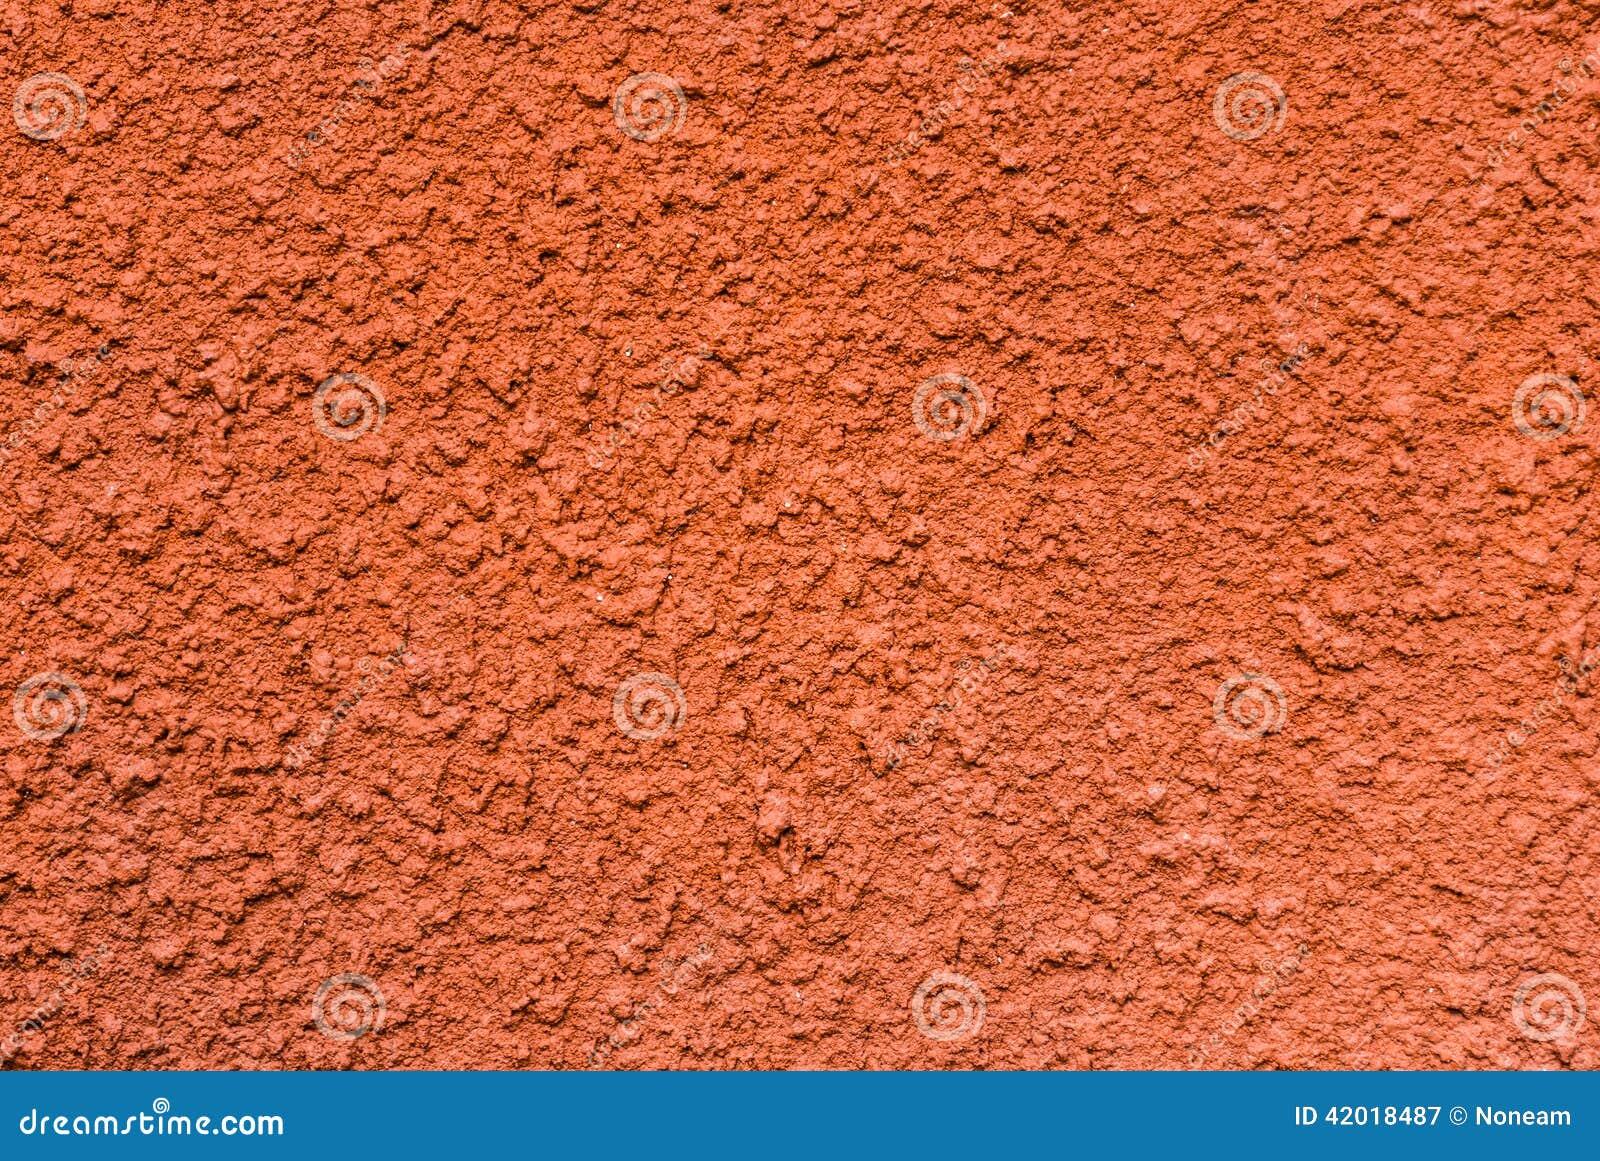 Orange Cement Wall : Orange rough concrete wall background texture stock photo